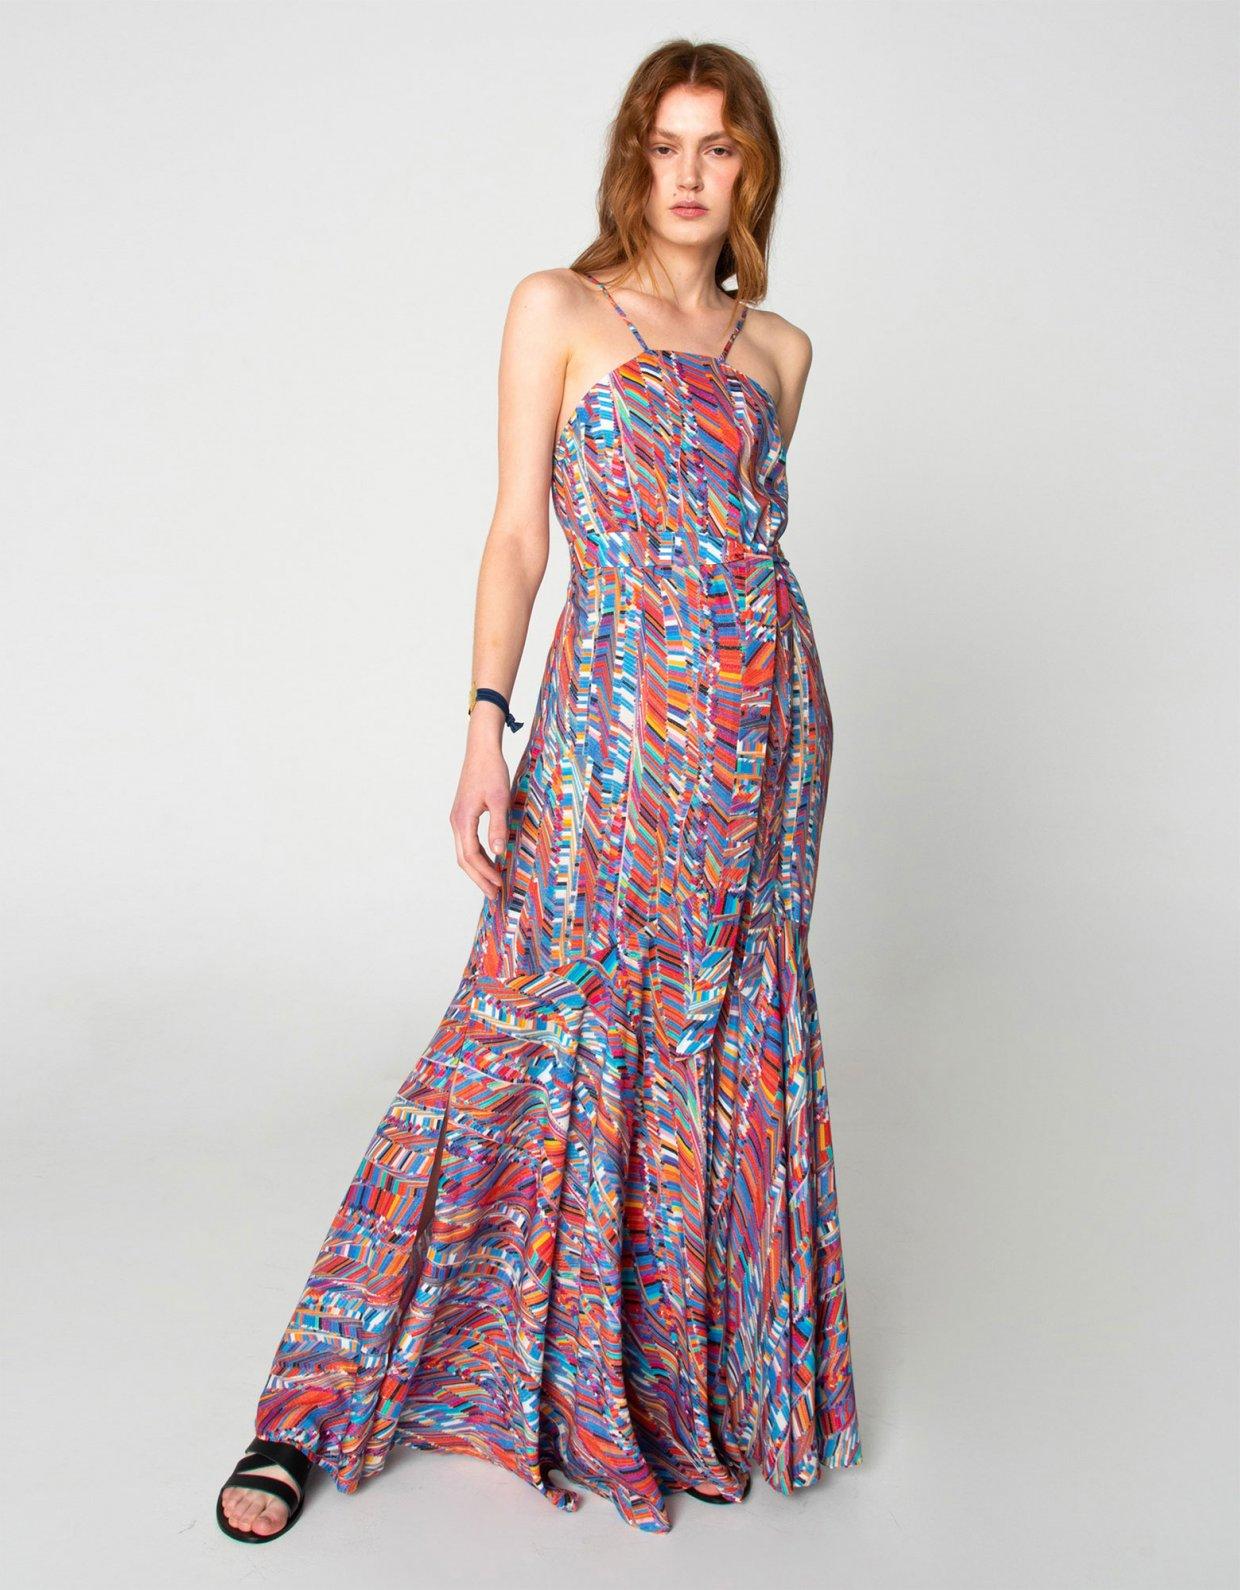 Nadia Rapti Into the jungle dress